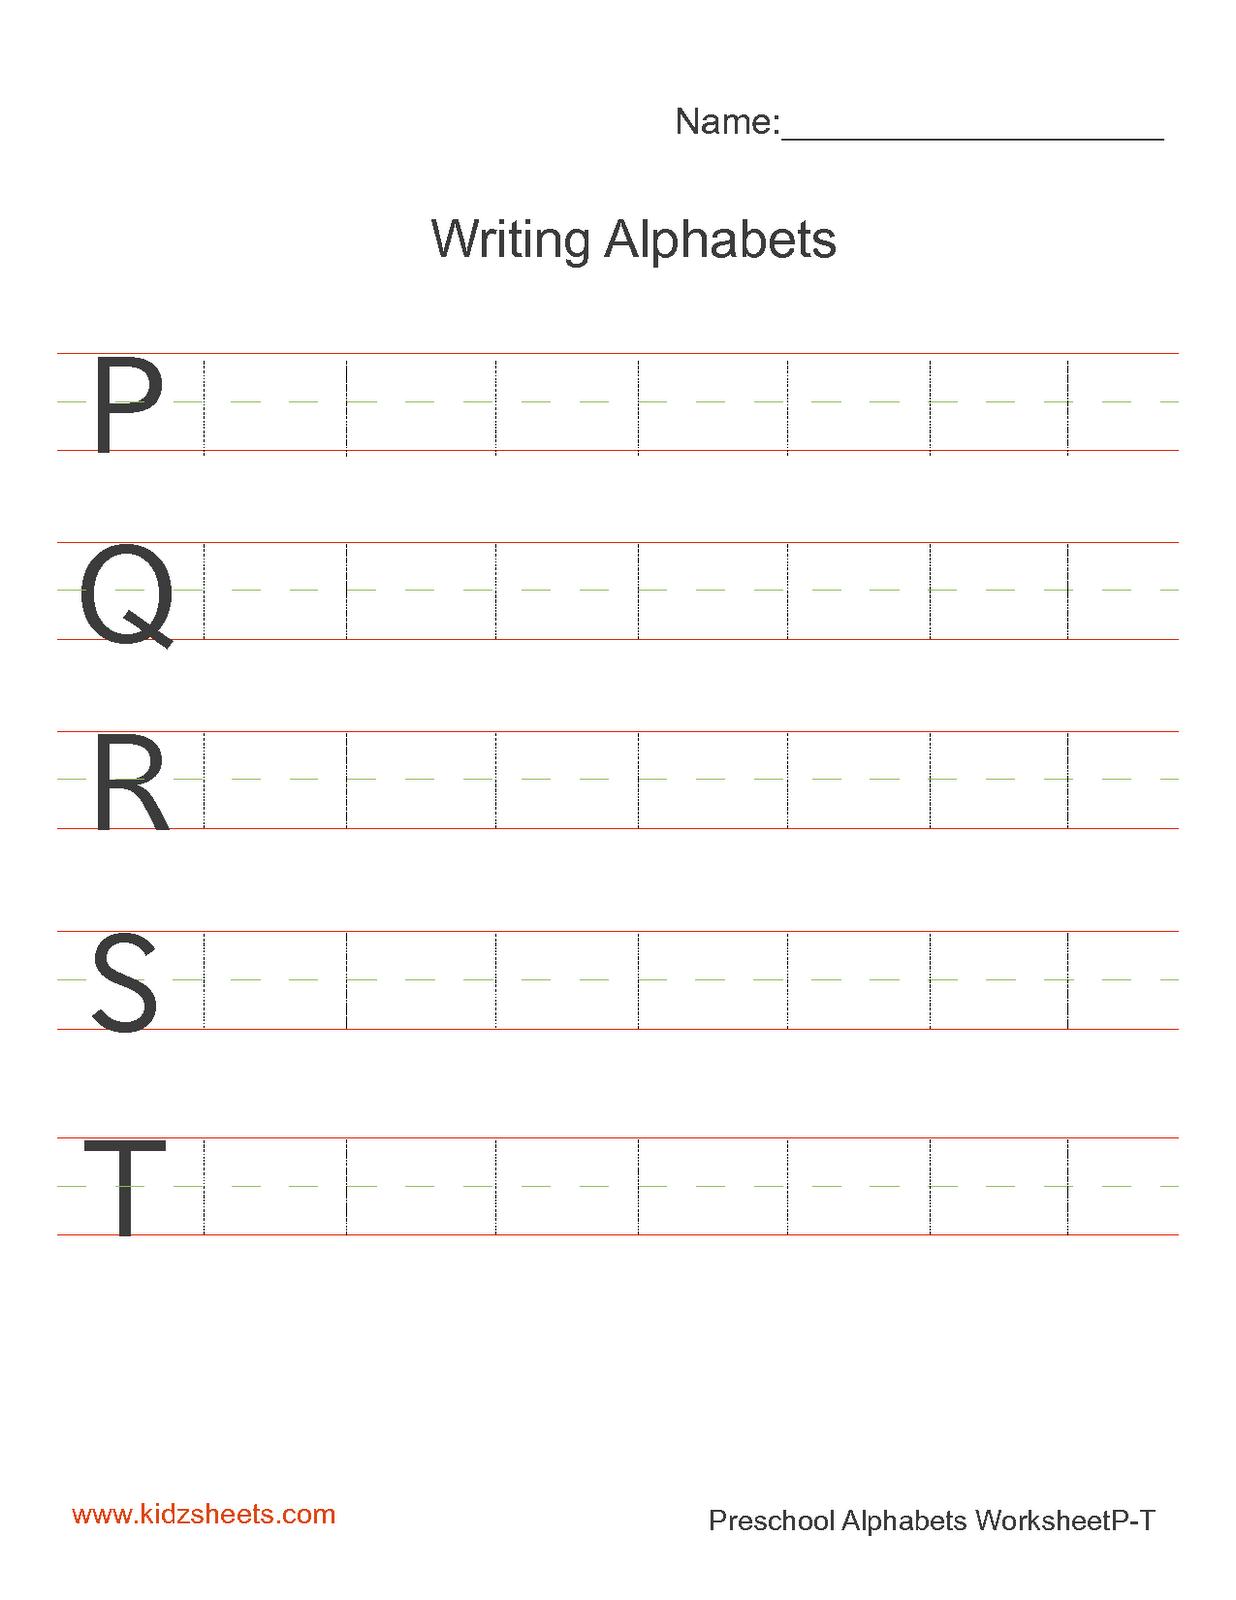 Kidz Worksheets Preschool Writing Alphabets Worksheet4